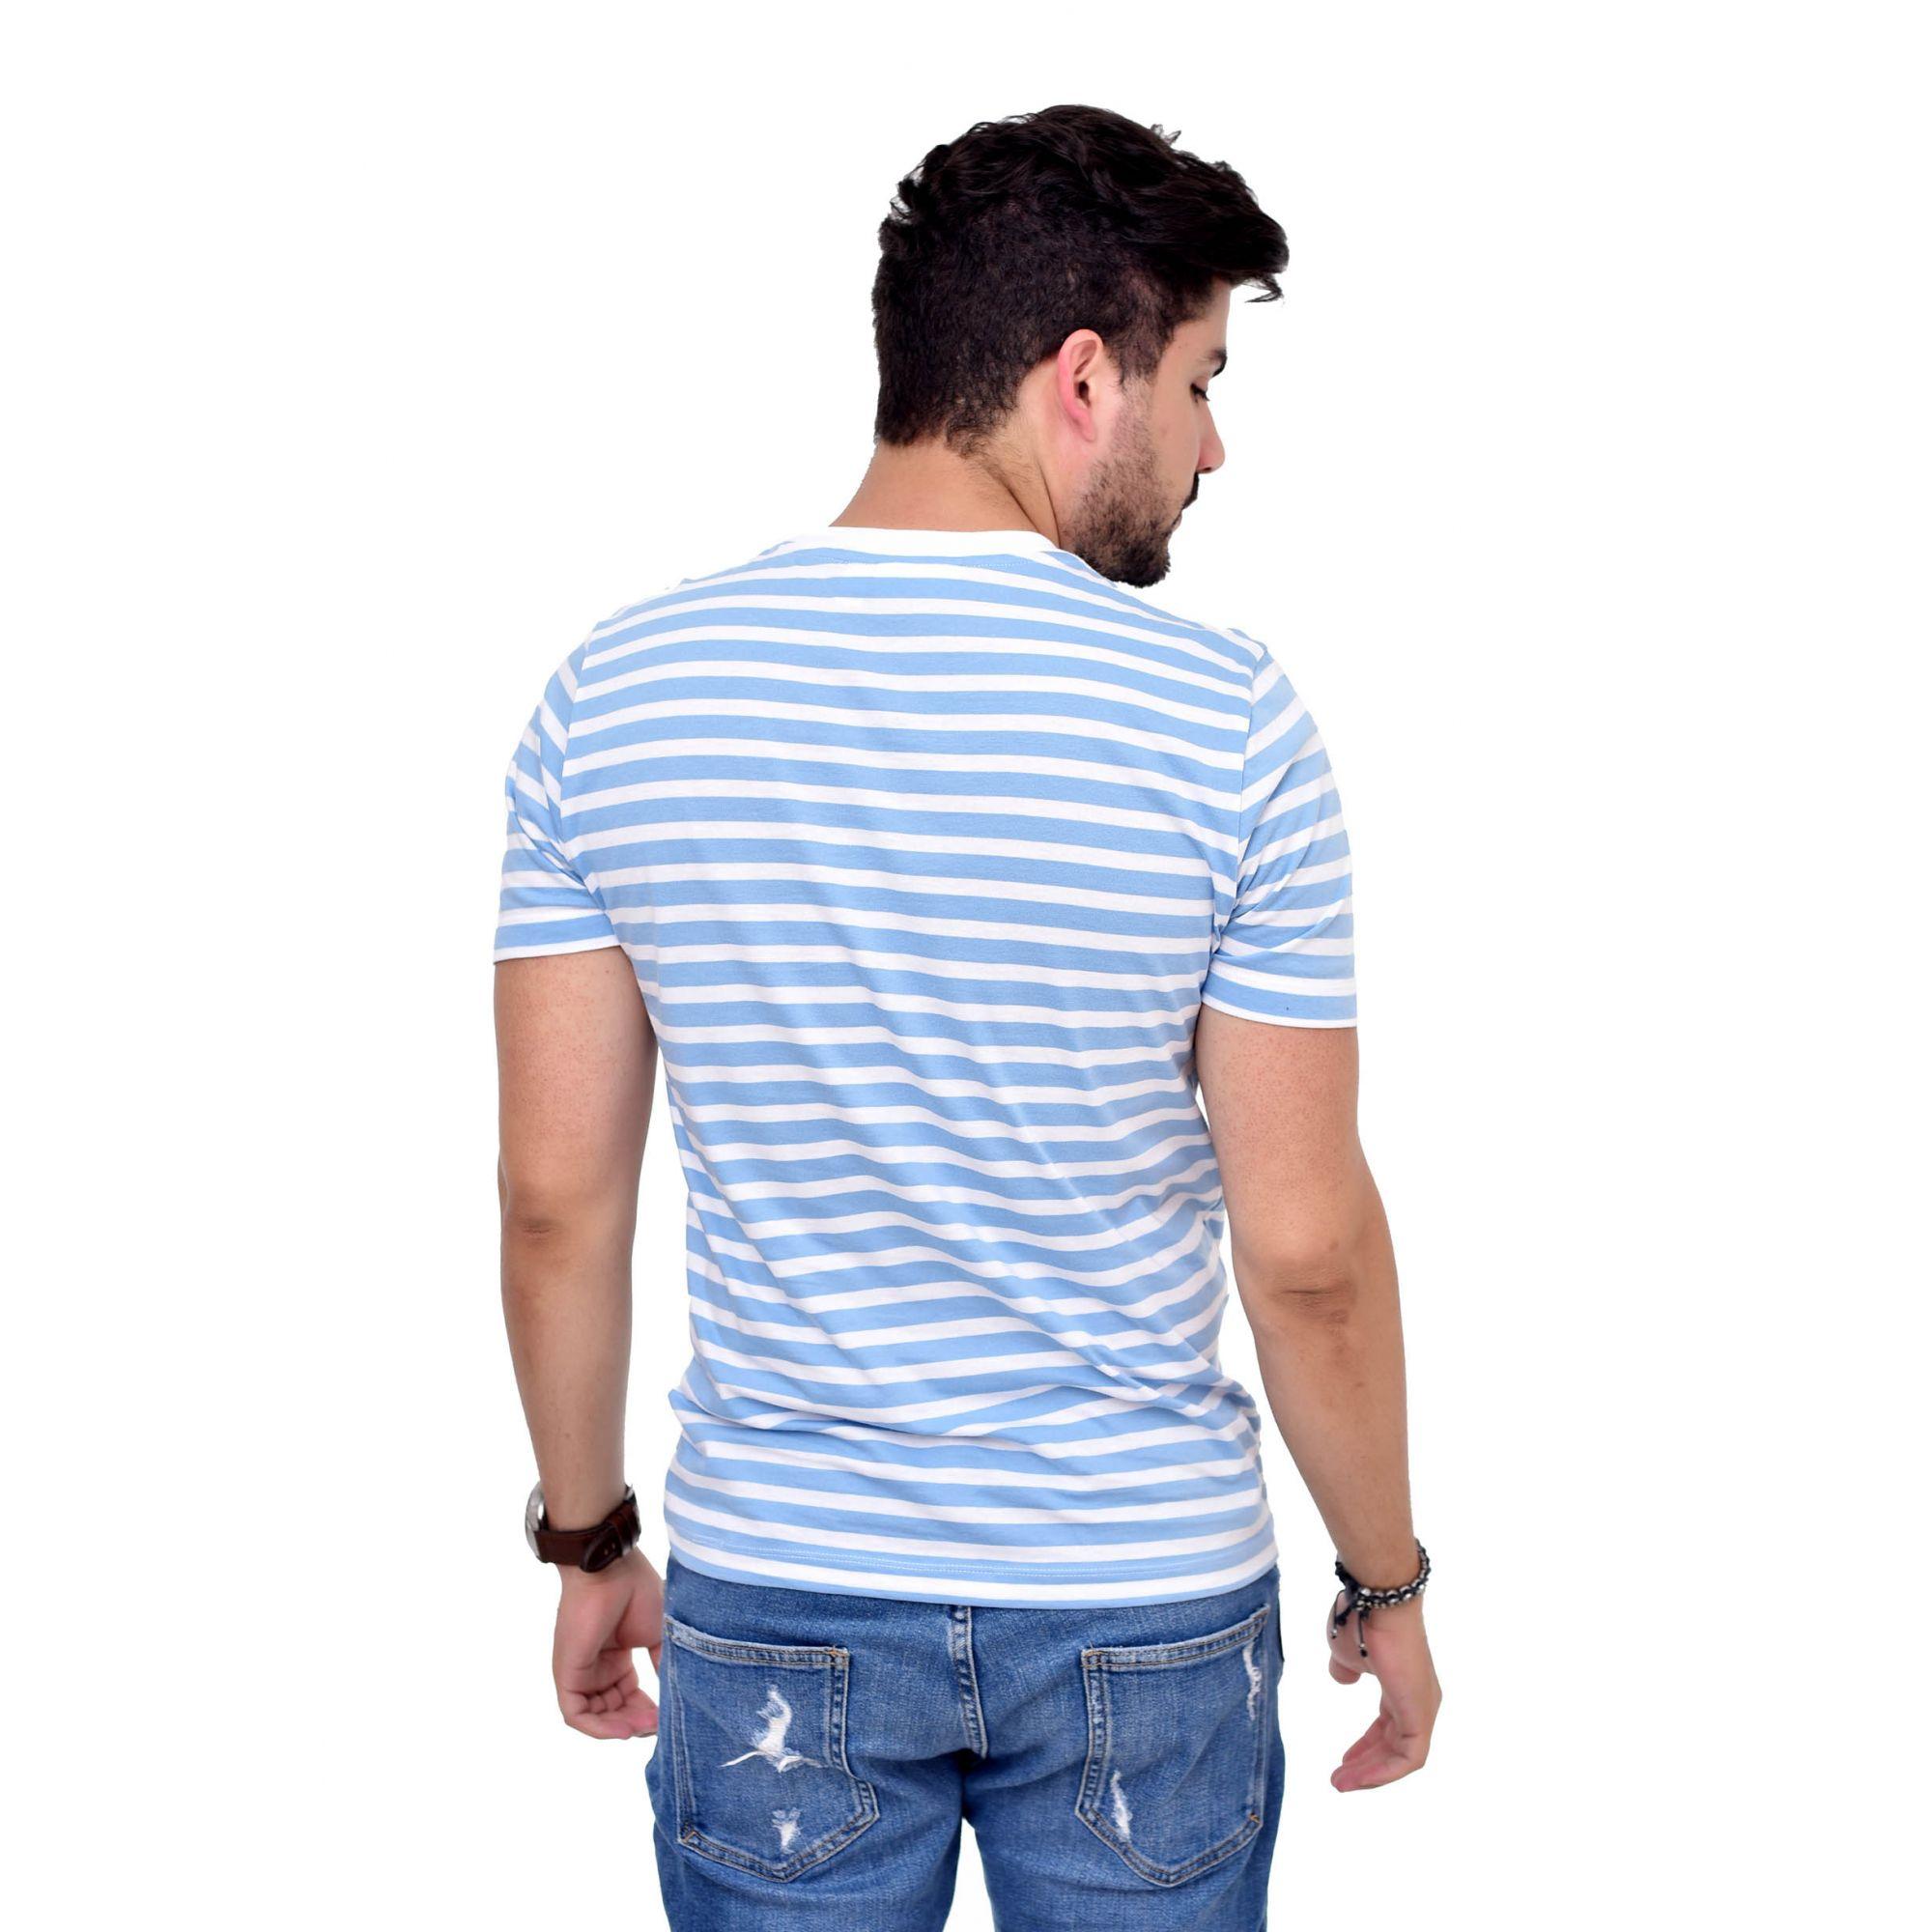 Camiseta Listrada L-21  - Ca Brasileira